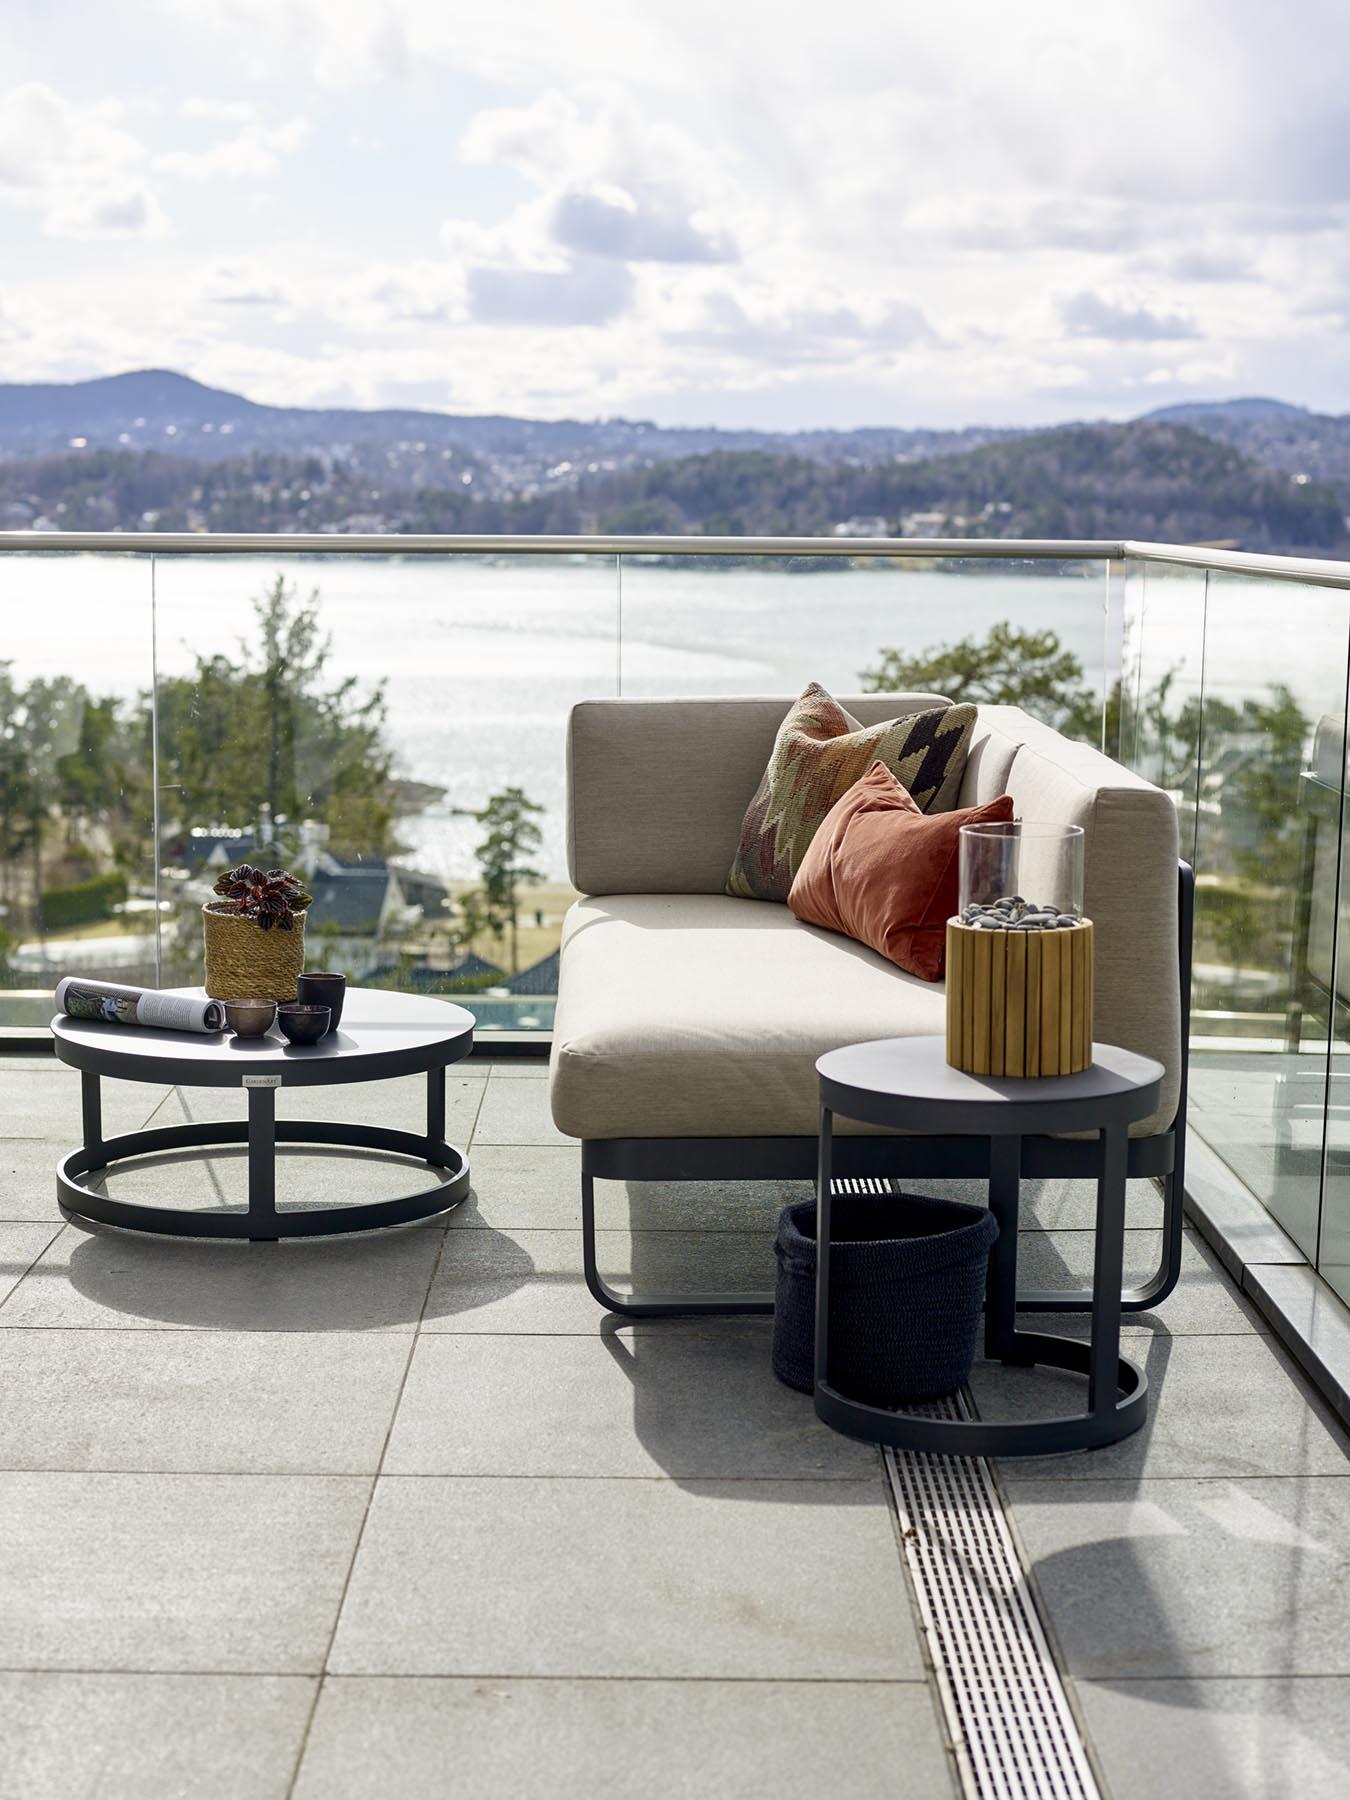 Liten modulsofa med rundt bord i sola på flott terrasse med fantastisk utsikt